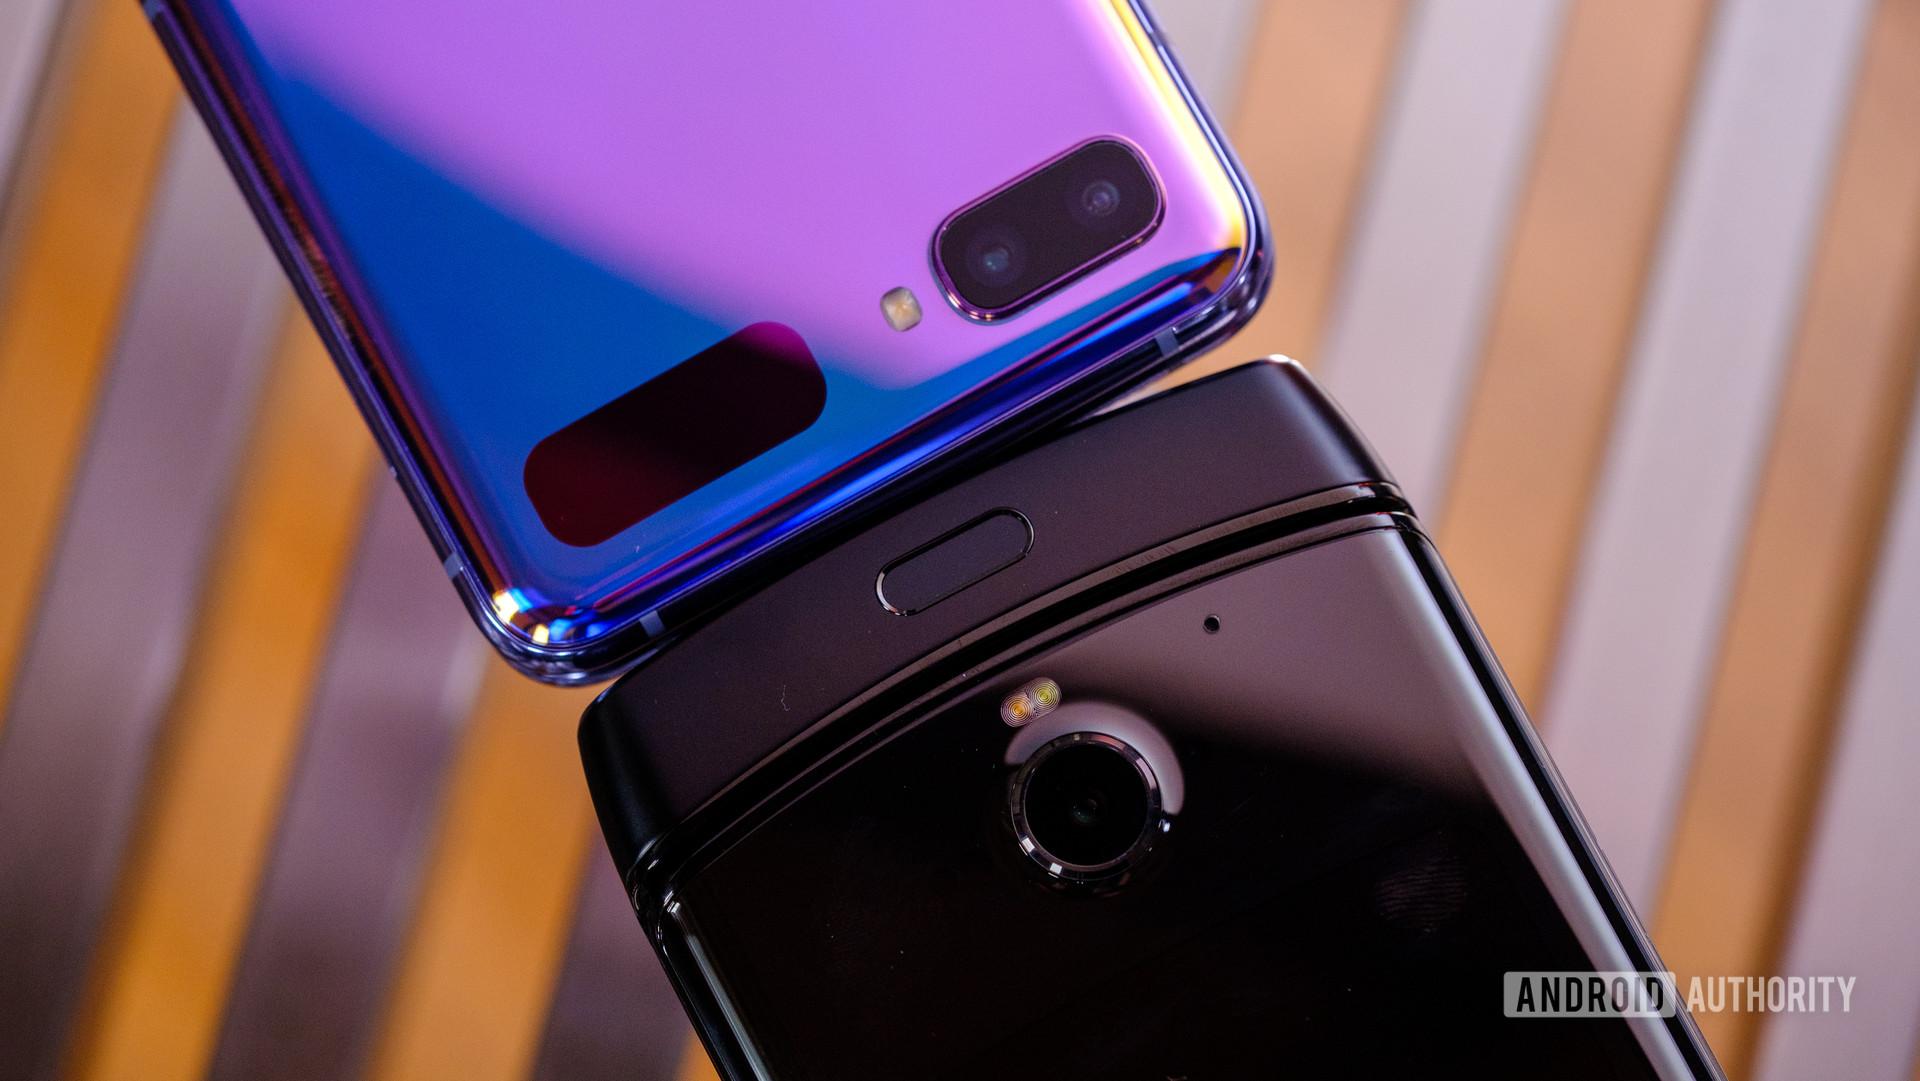 Foldable phones quiz: True or false